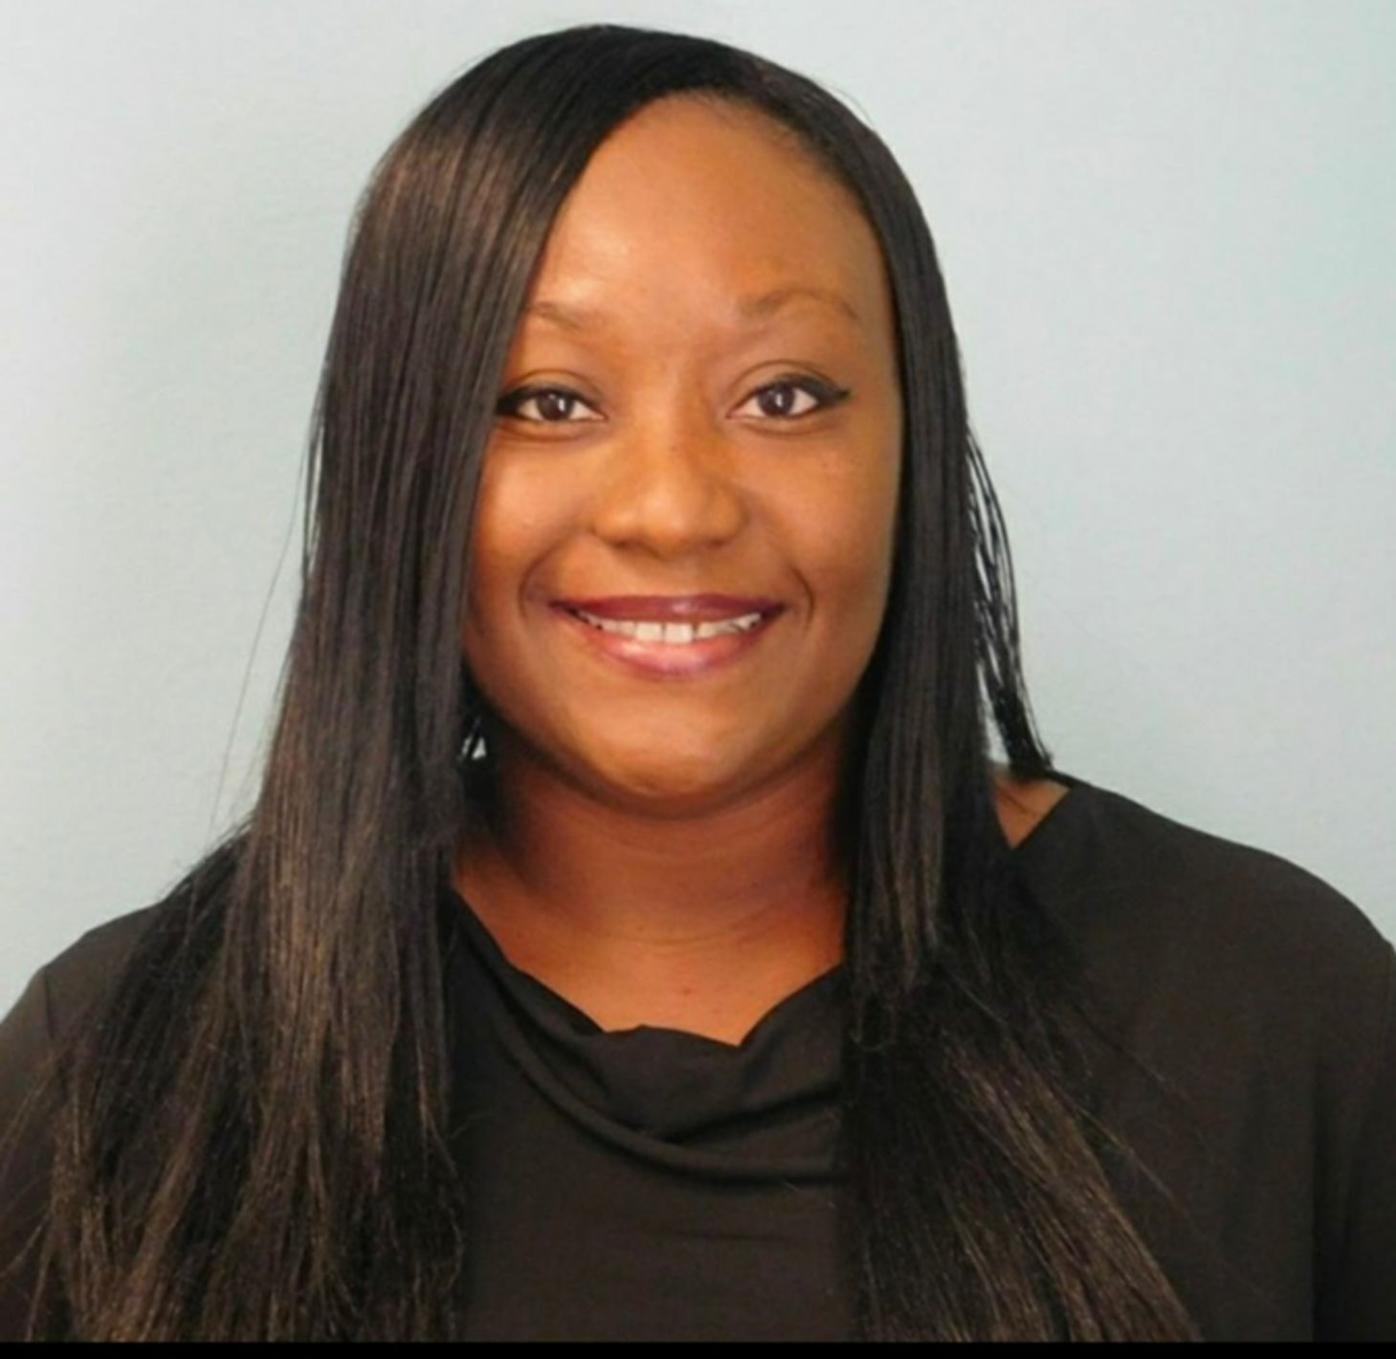 Hannibal School Board candidate Tysa Coleman